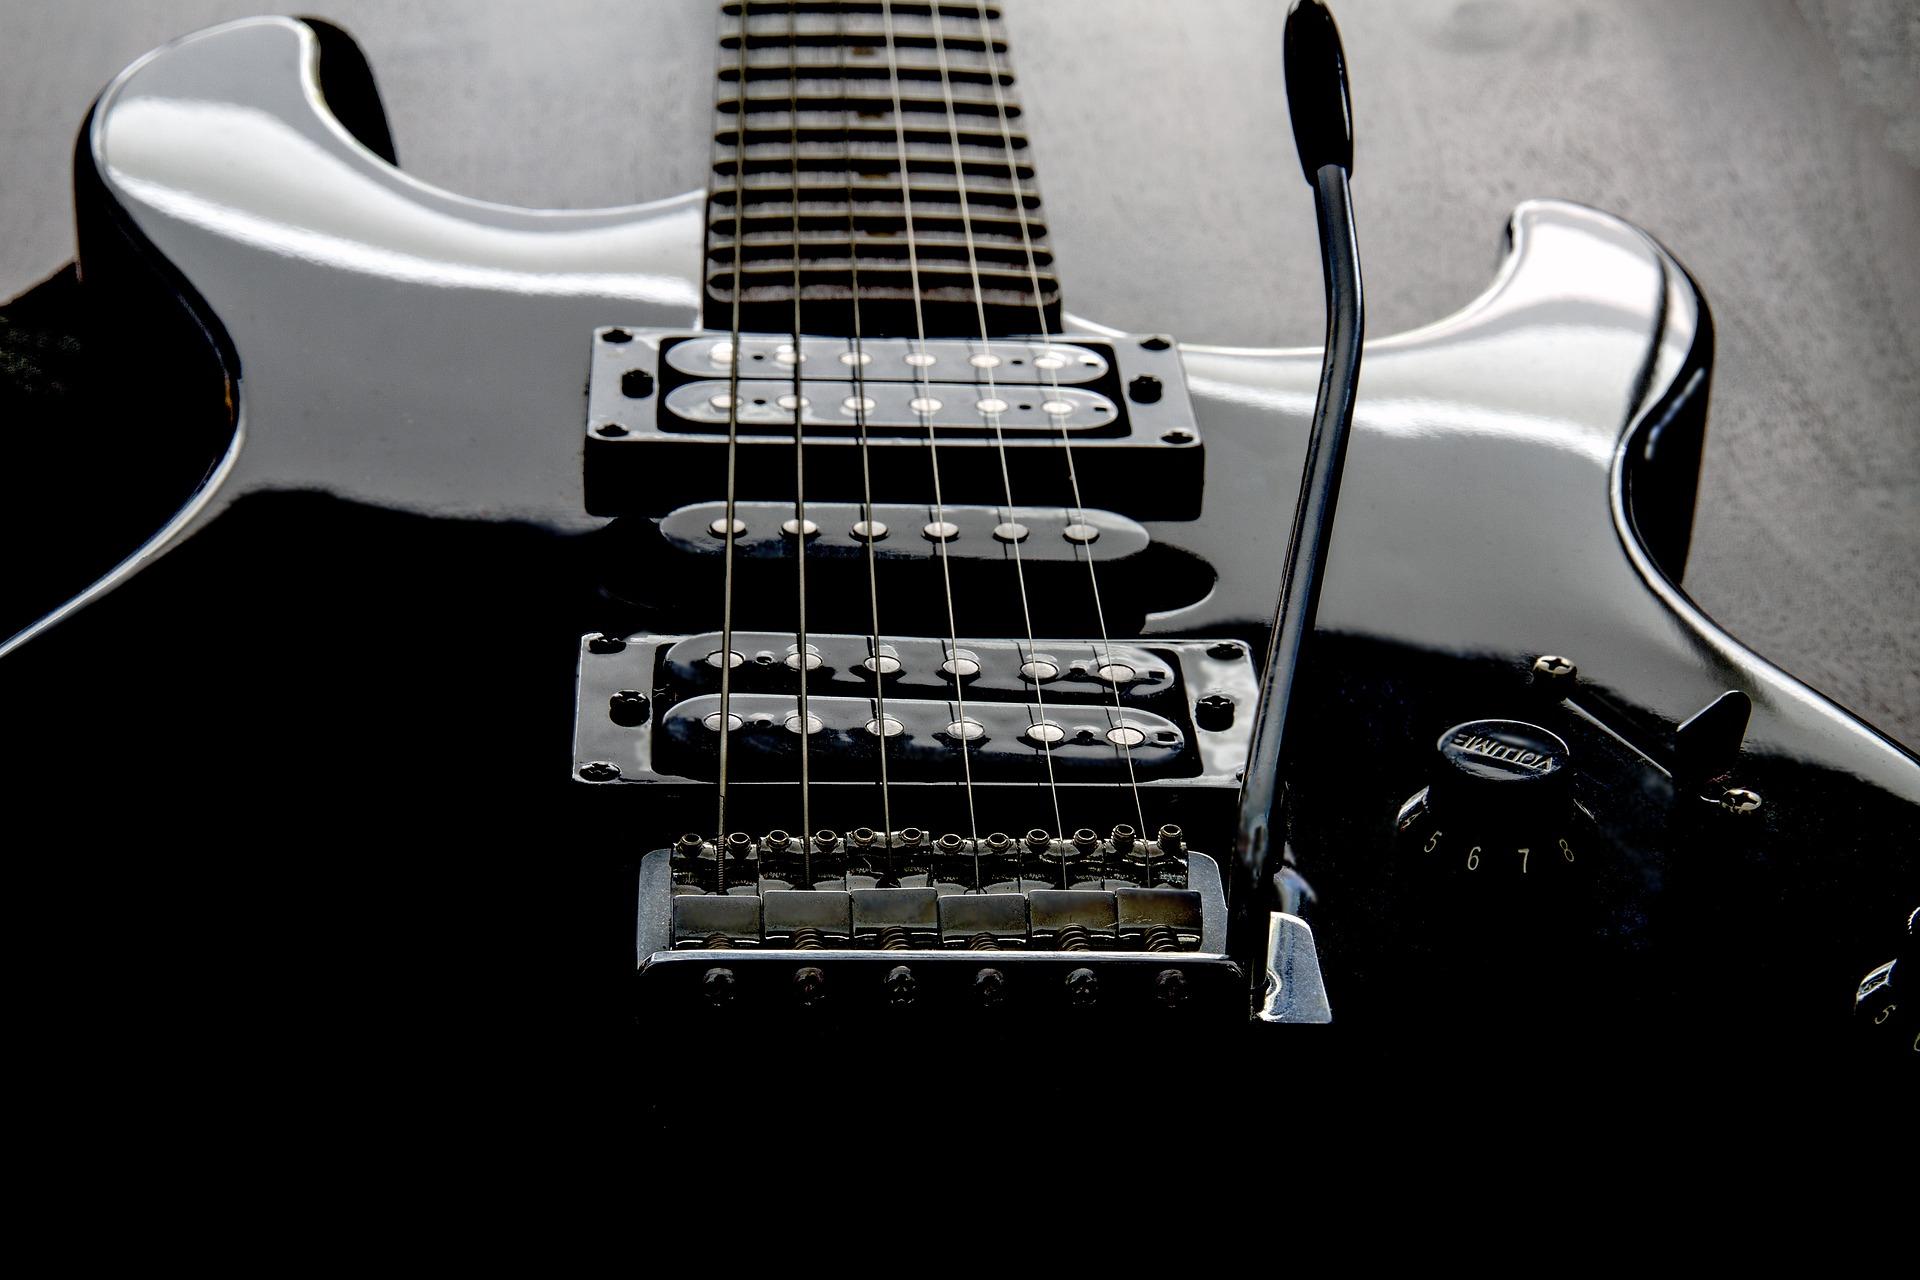 guitar-2472245_1920jpg